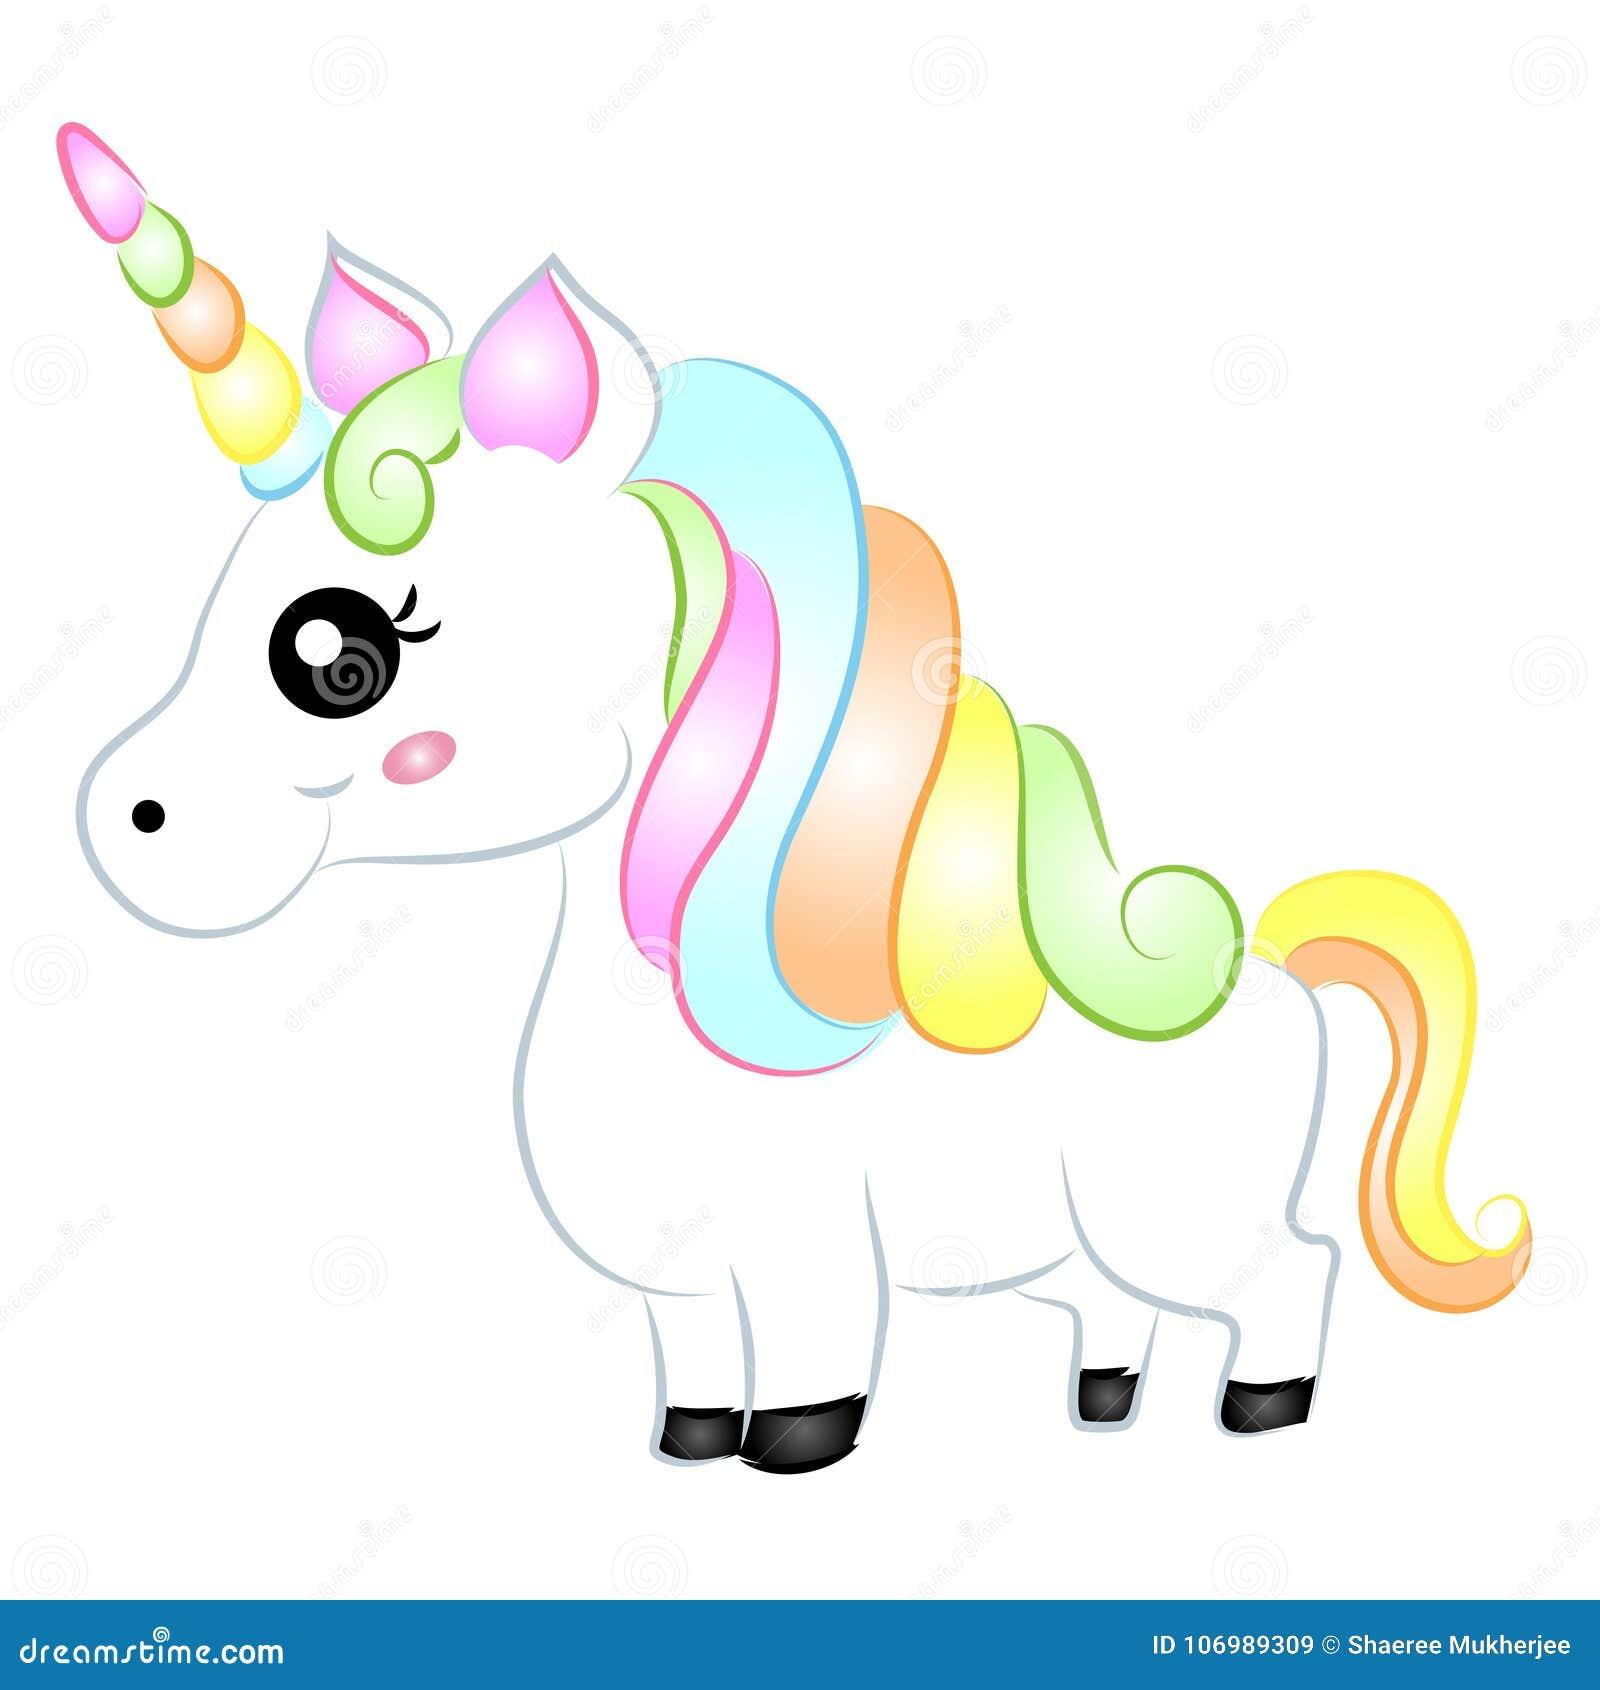 Show Me A Picture Of A Rainbow Unicorn - impremedia.net